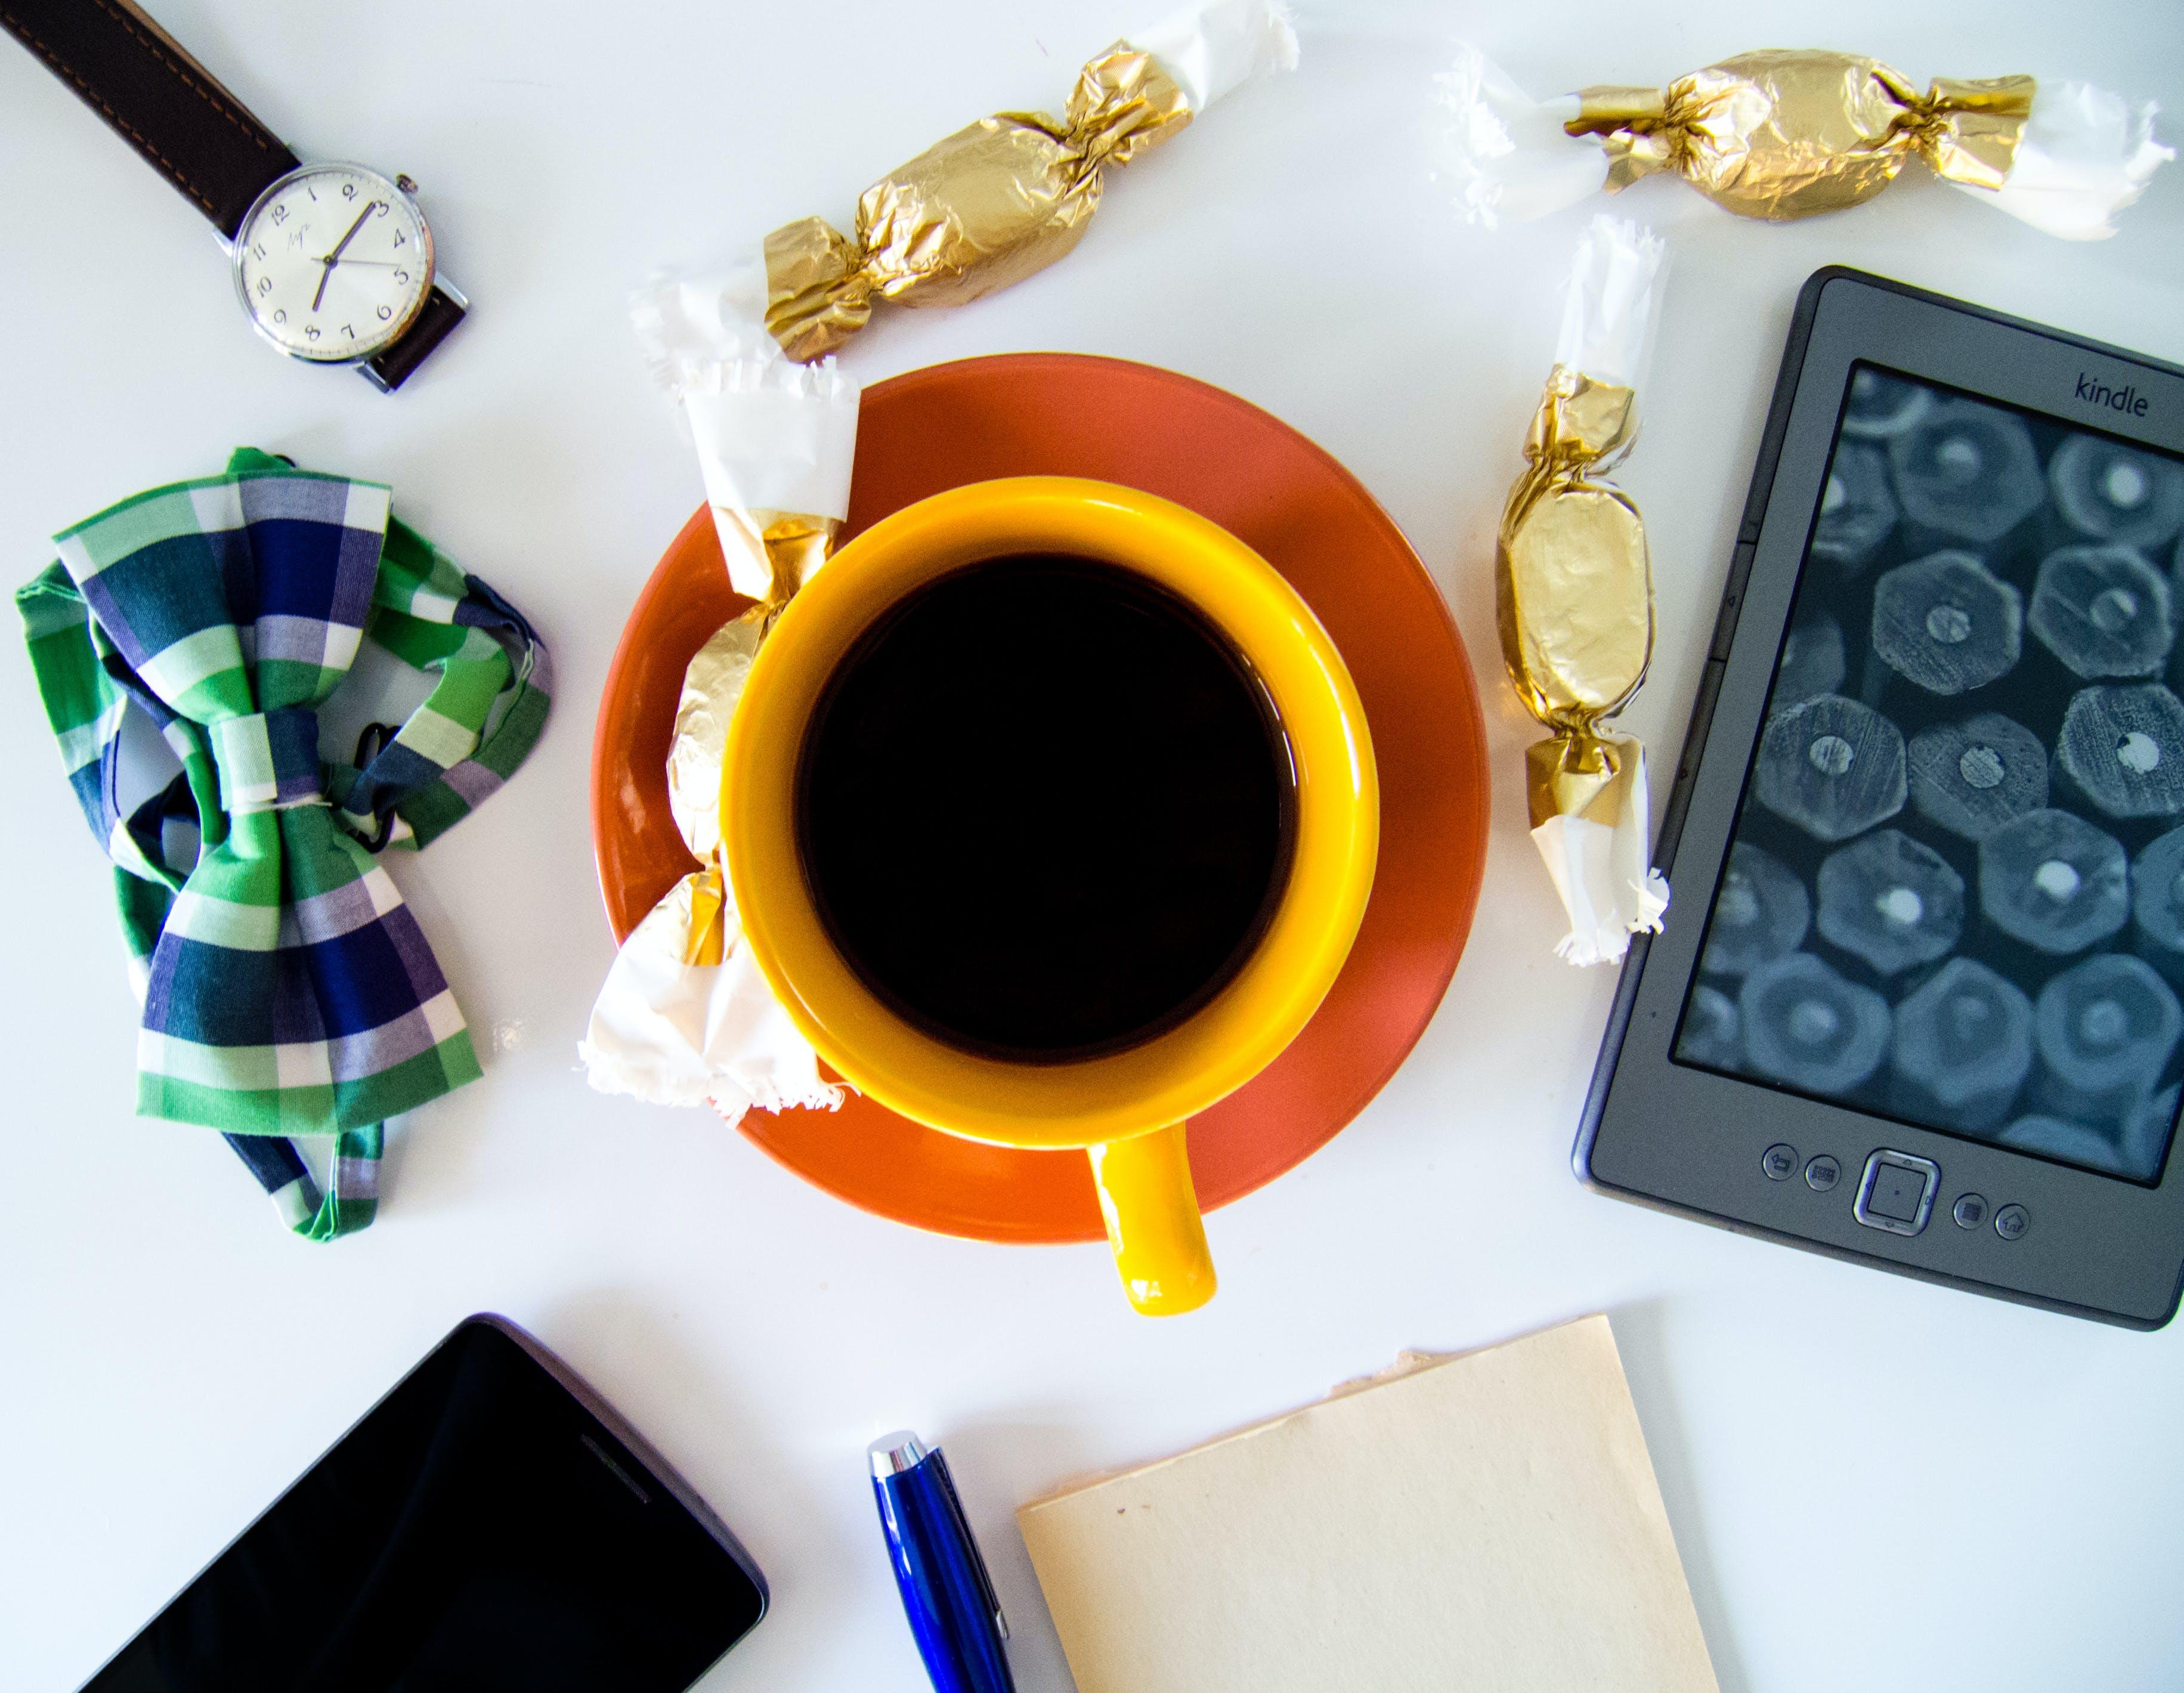 Free stock photo of bow tie, art, creative, smartphone